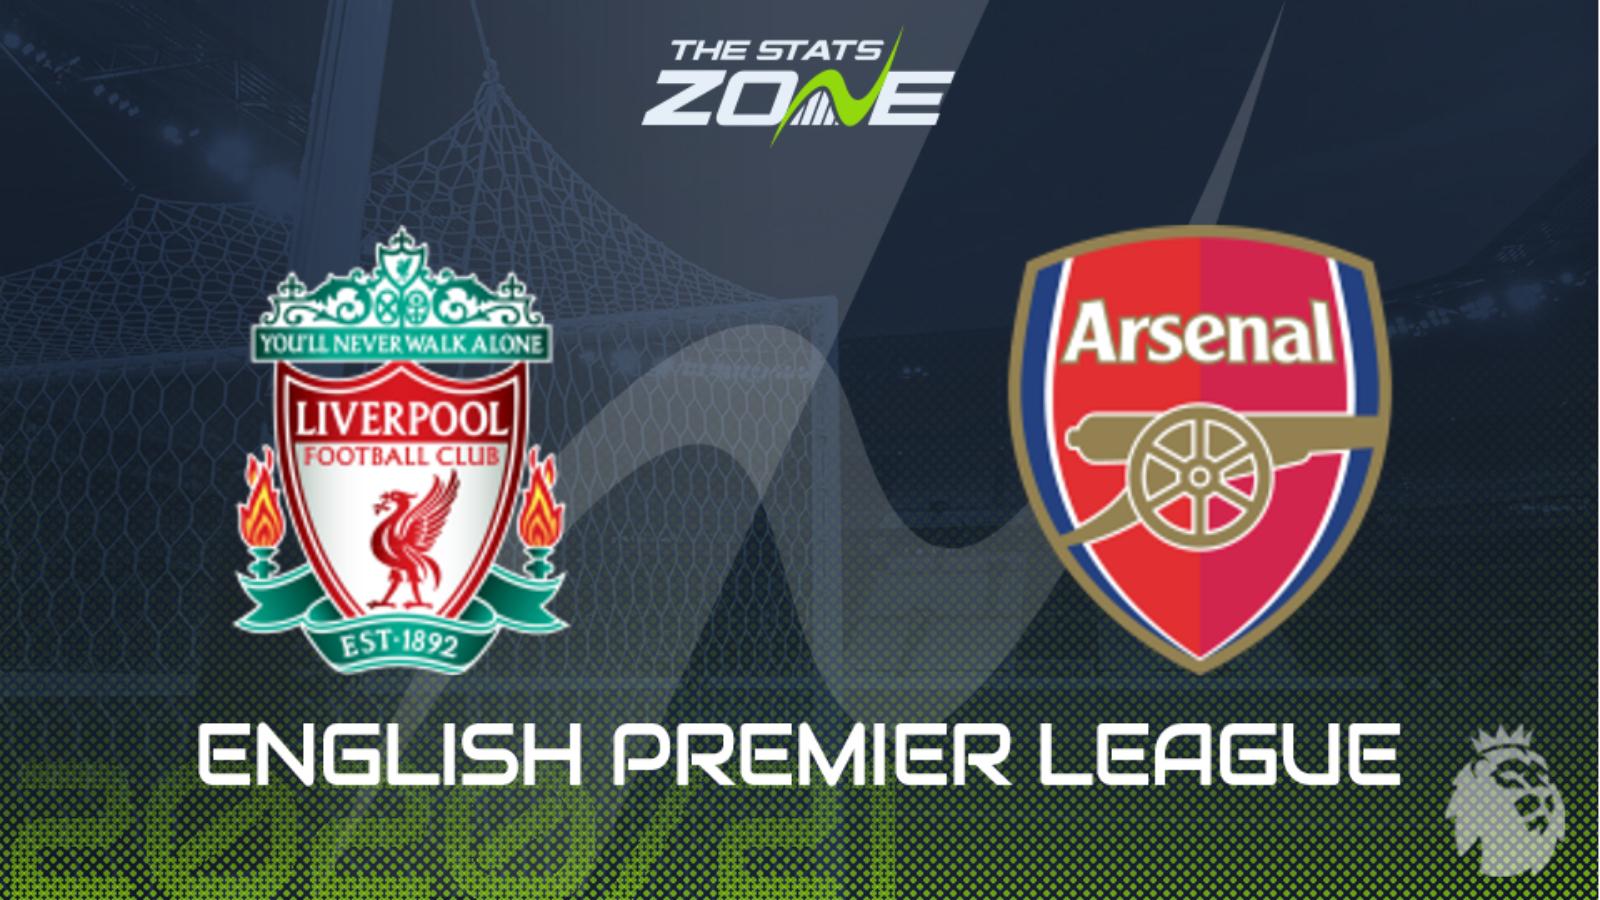 2020 21 Premier League Liverpool Vs Arsenal Preview Prediction The Stats Zone